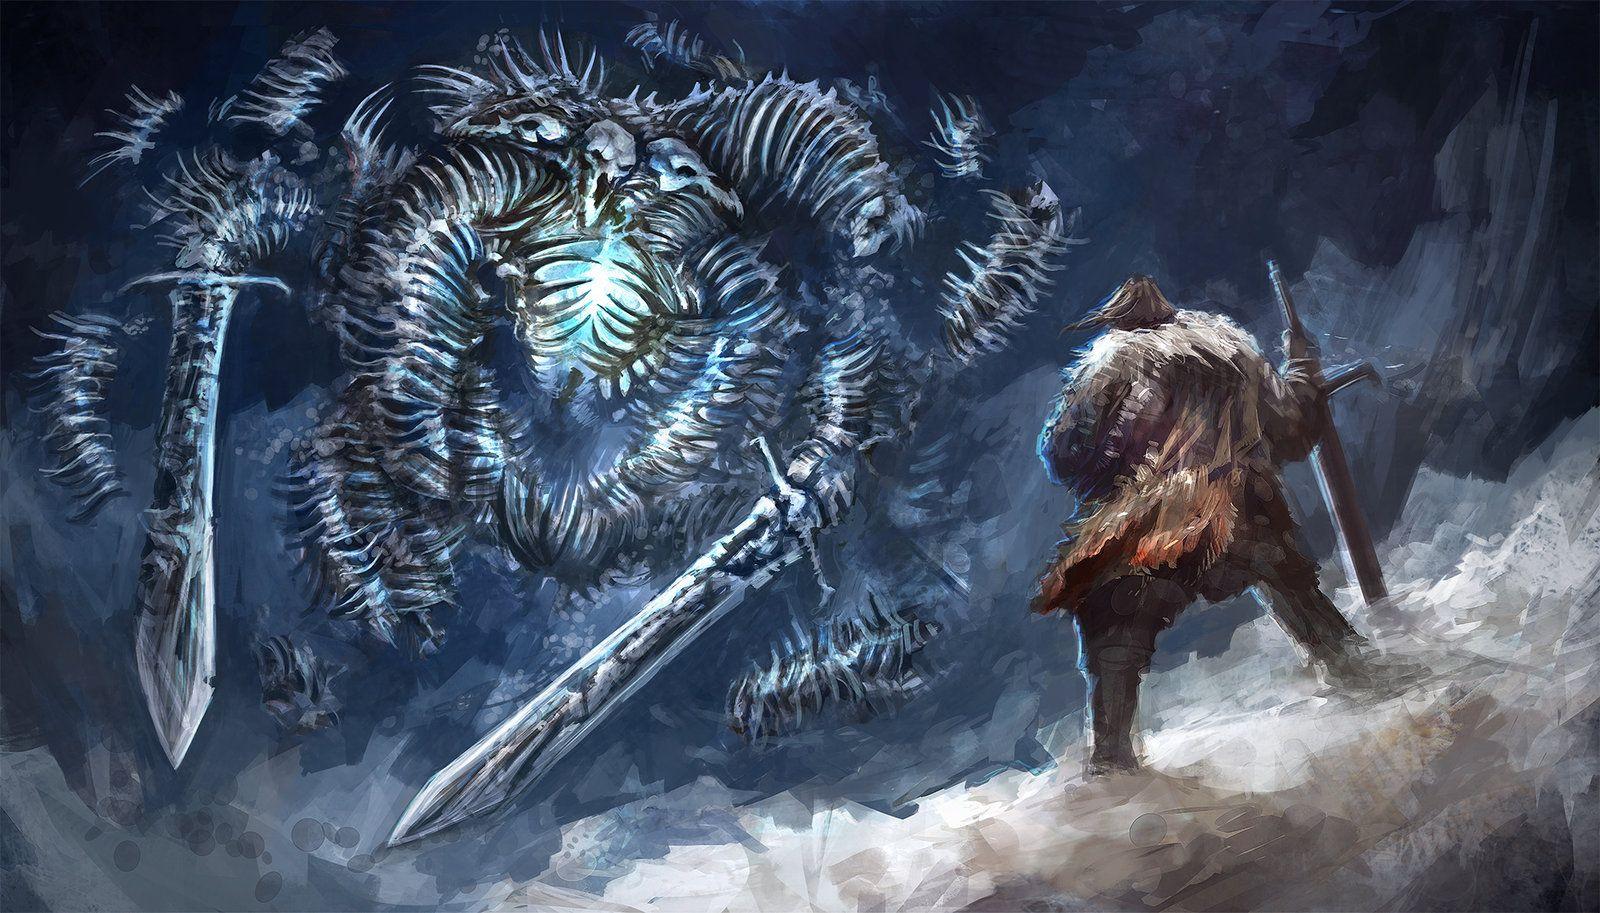 Bound By Flame Bones And Ice Alexandre Chaudret Dark Fantasy Art Art Station Artwork